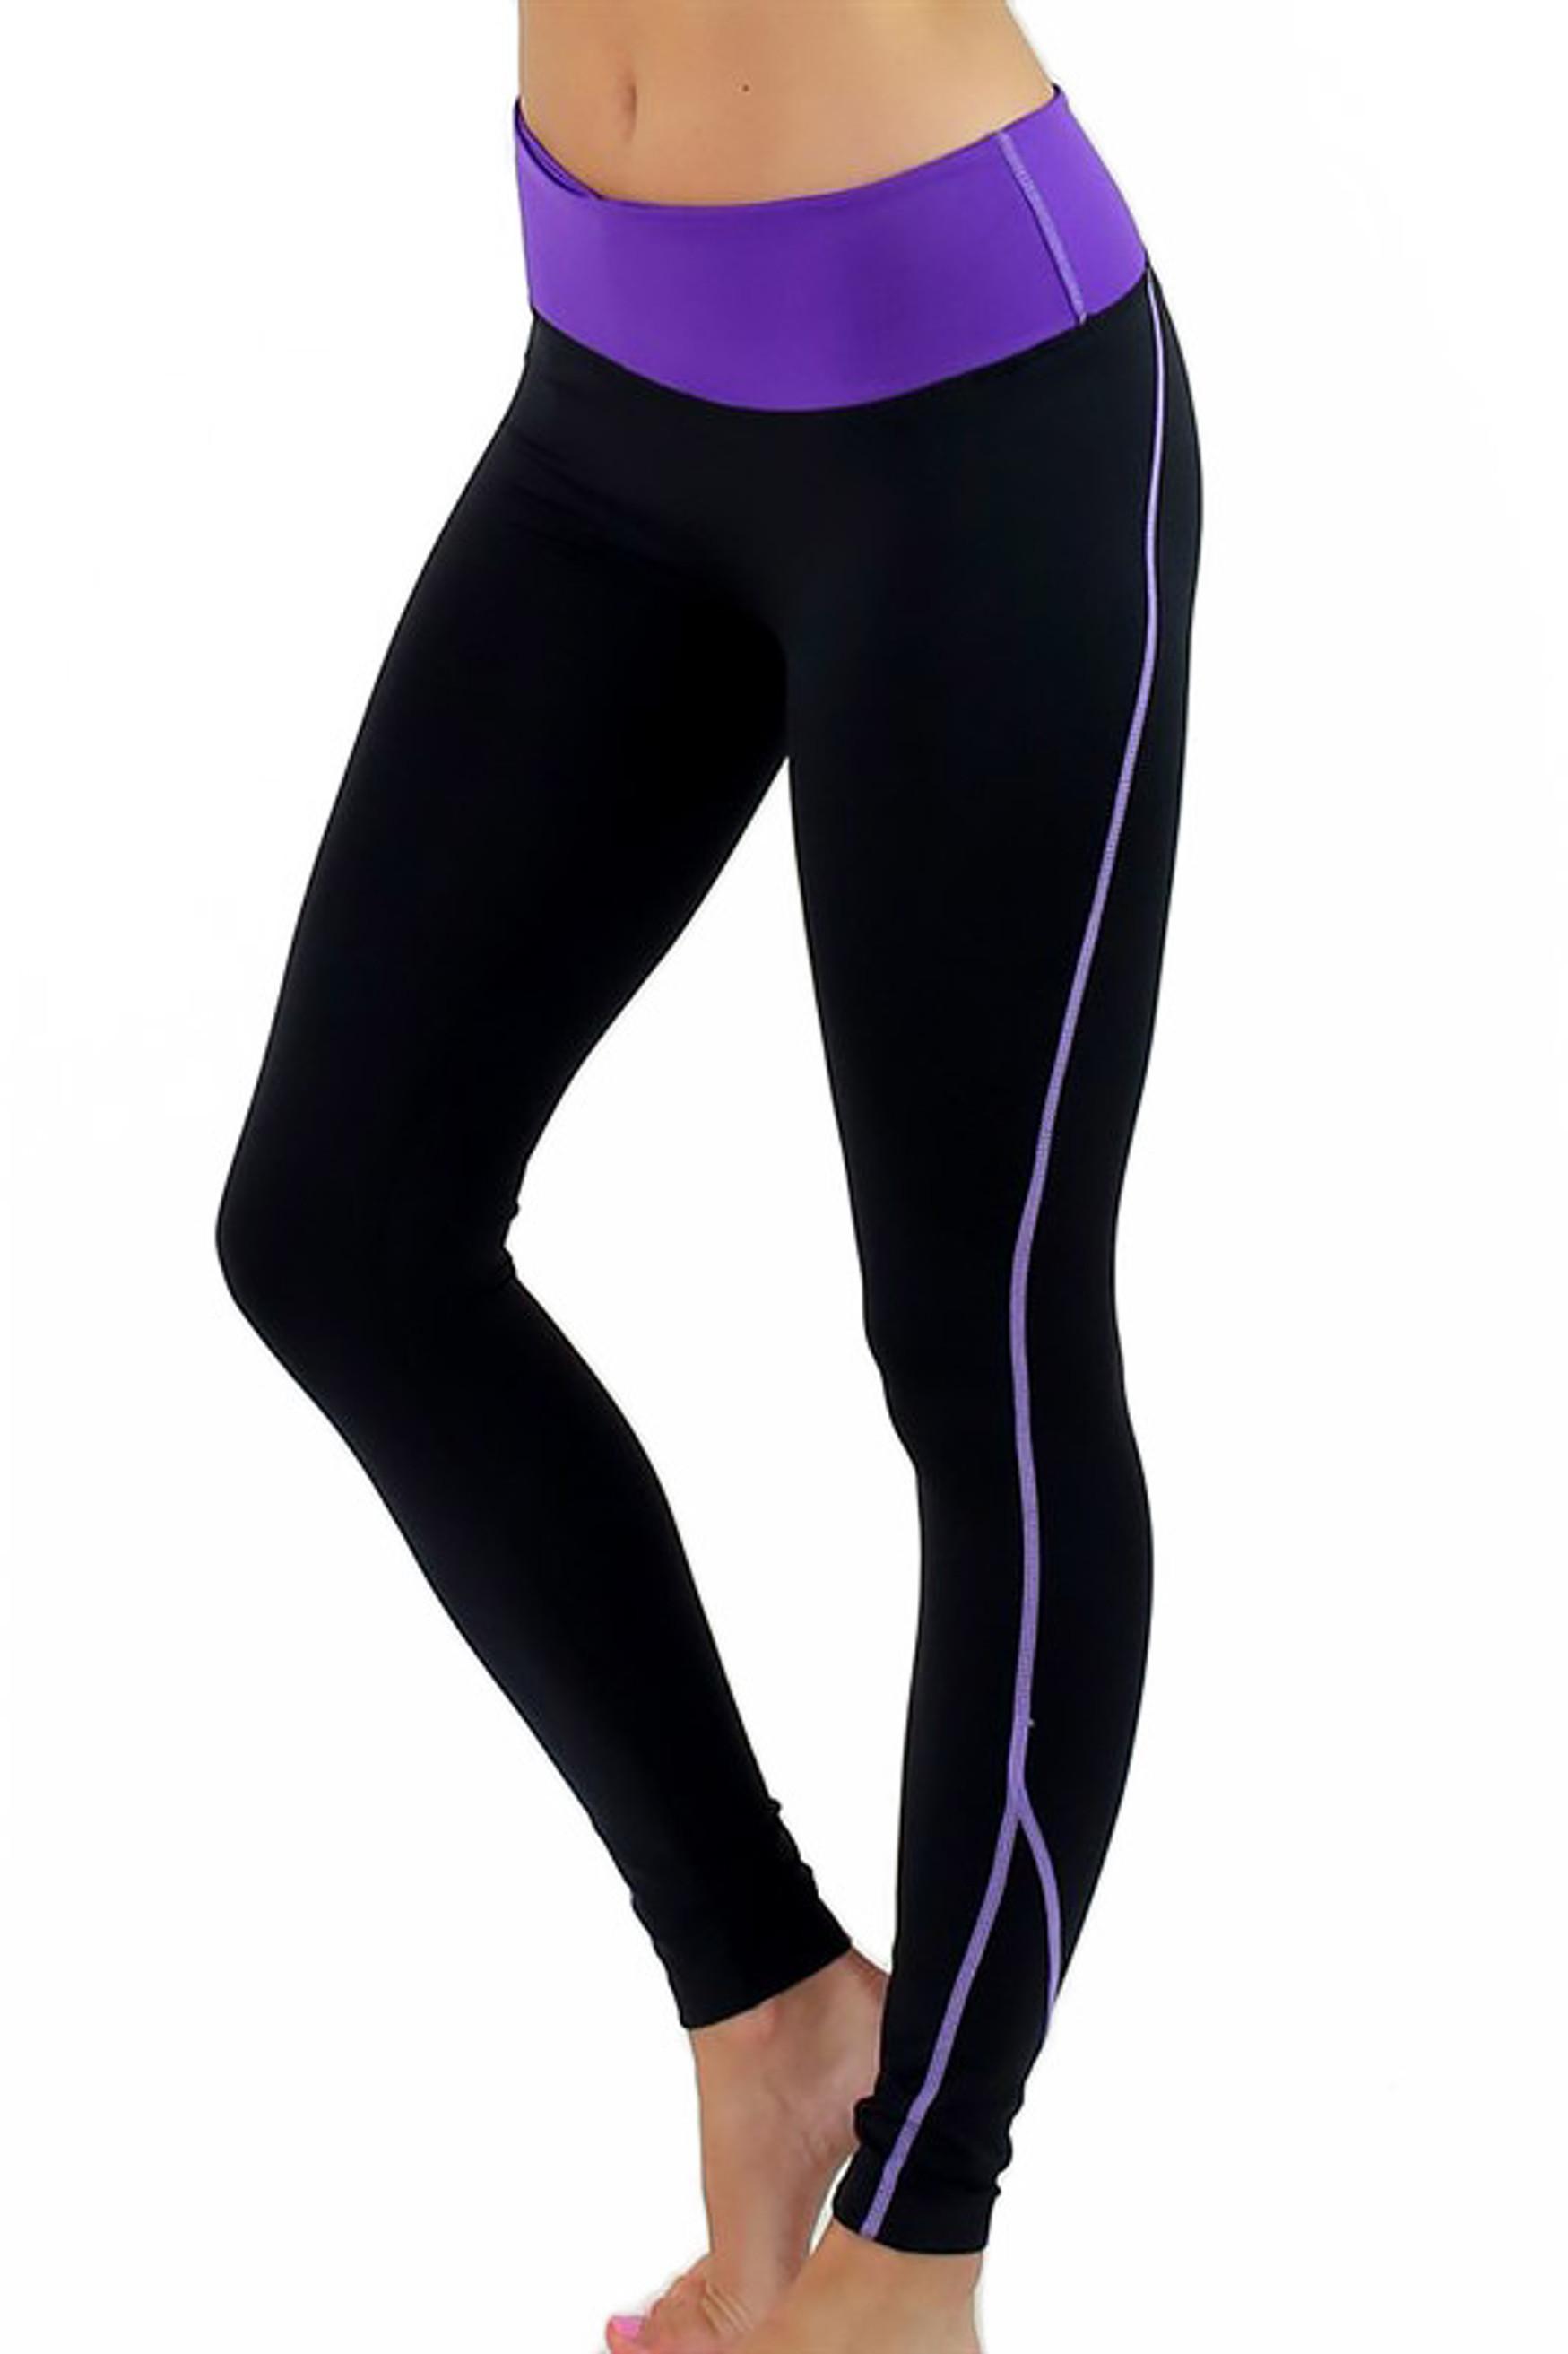 Illuminate Women's Sport Leggings